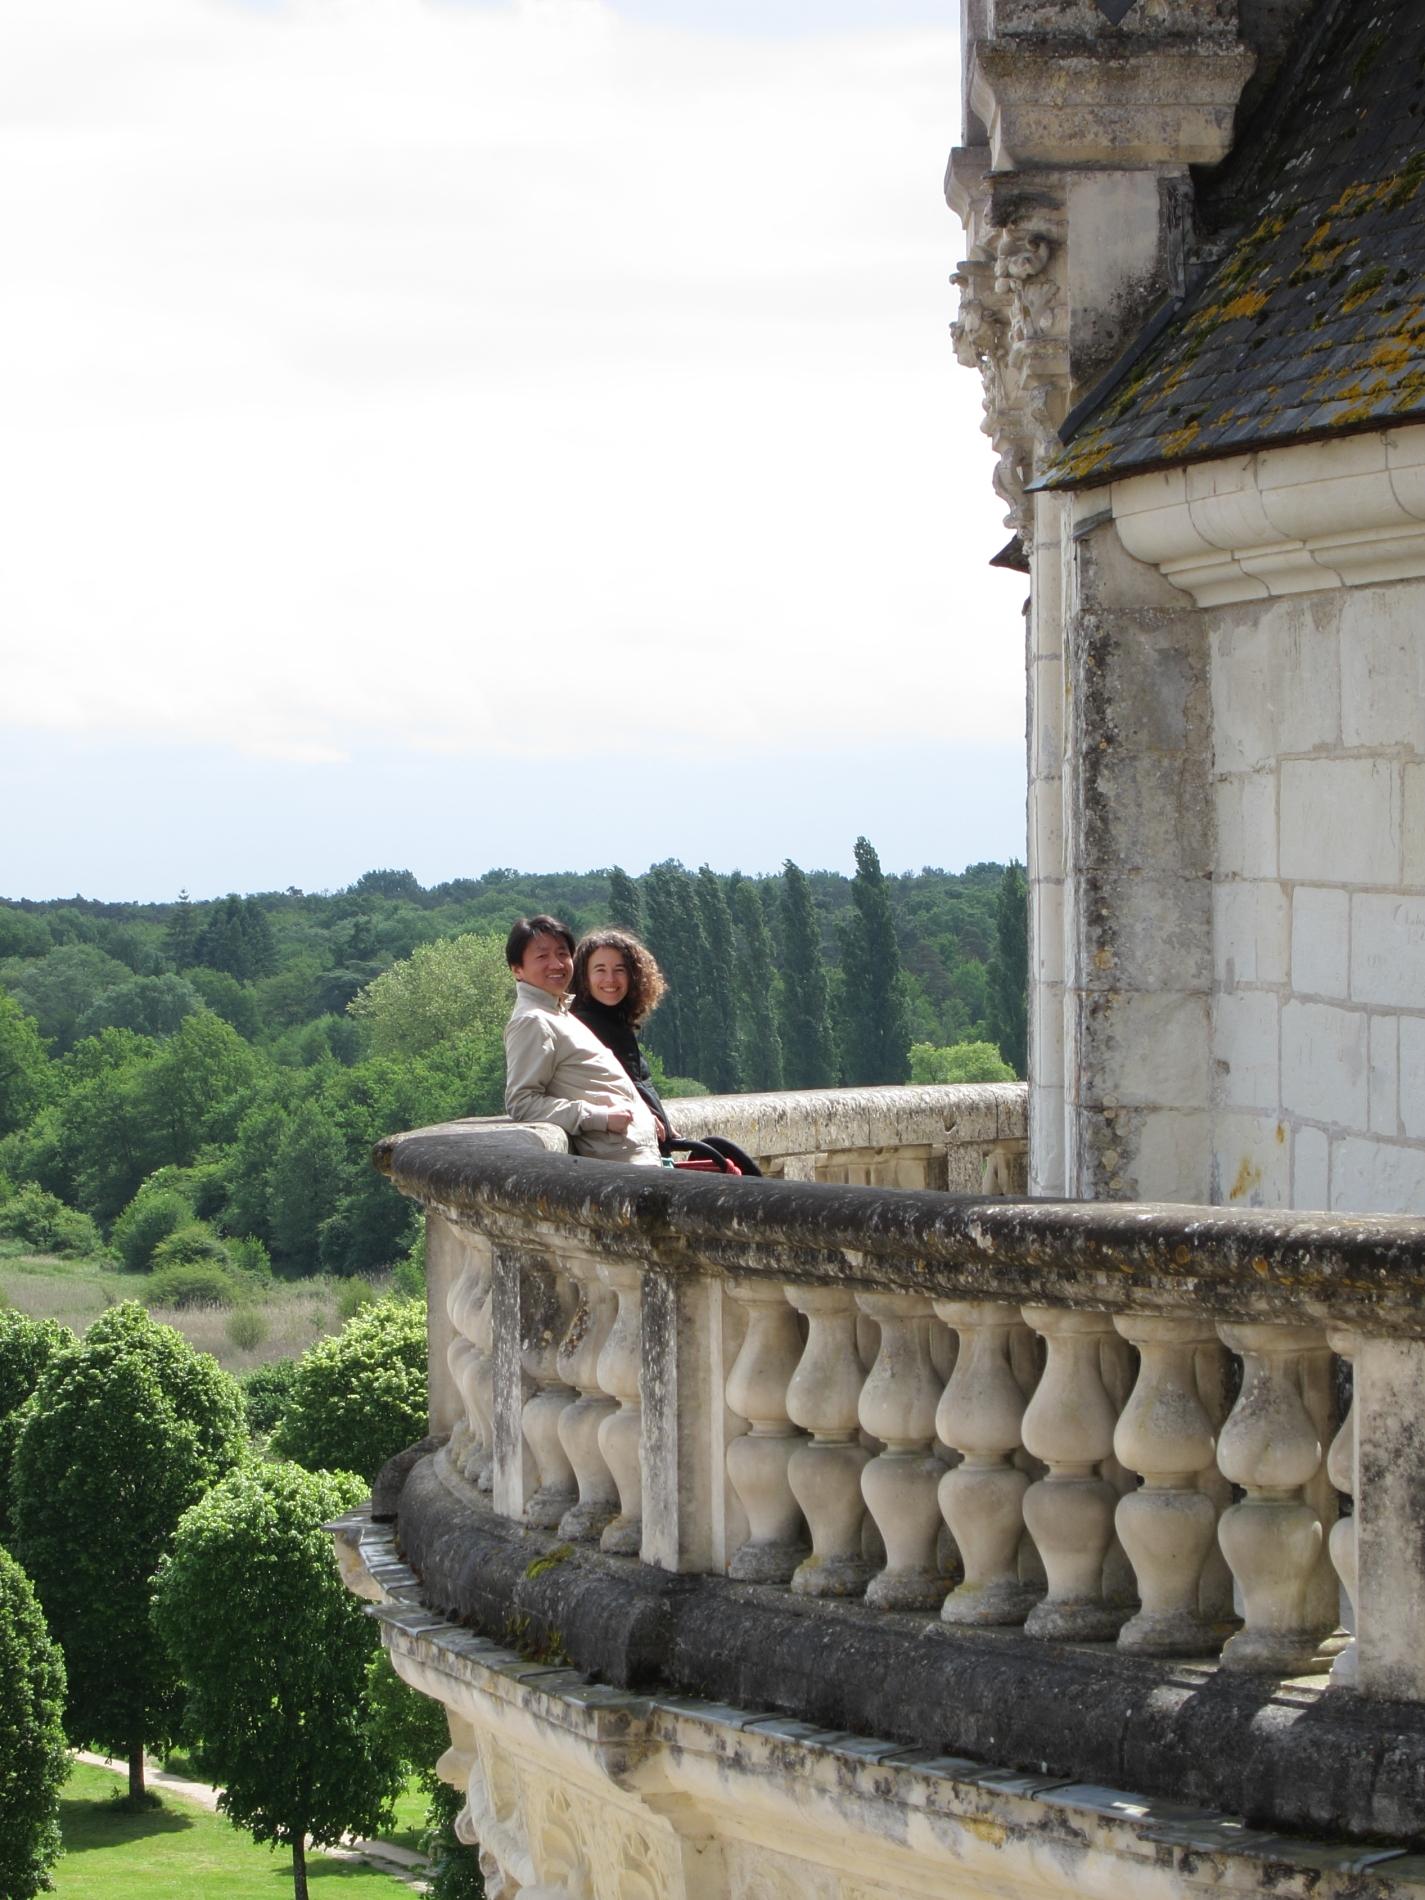 Zhizhong and Lisa at le château de Chambord.